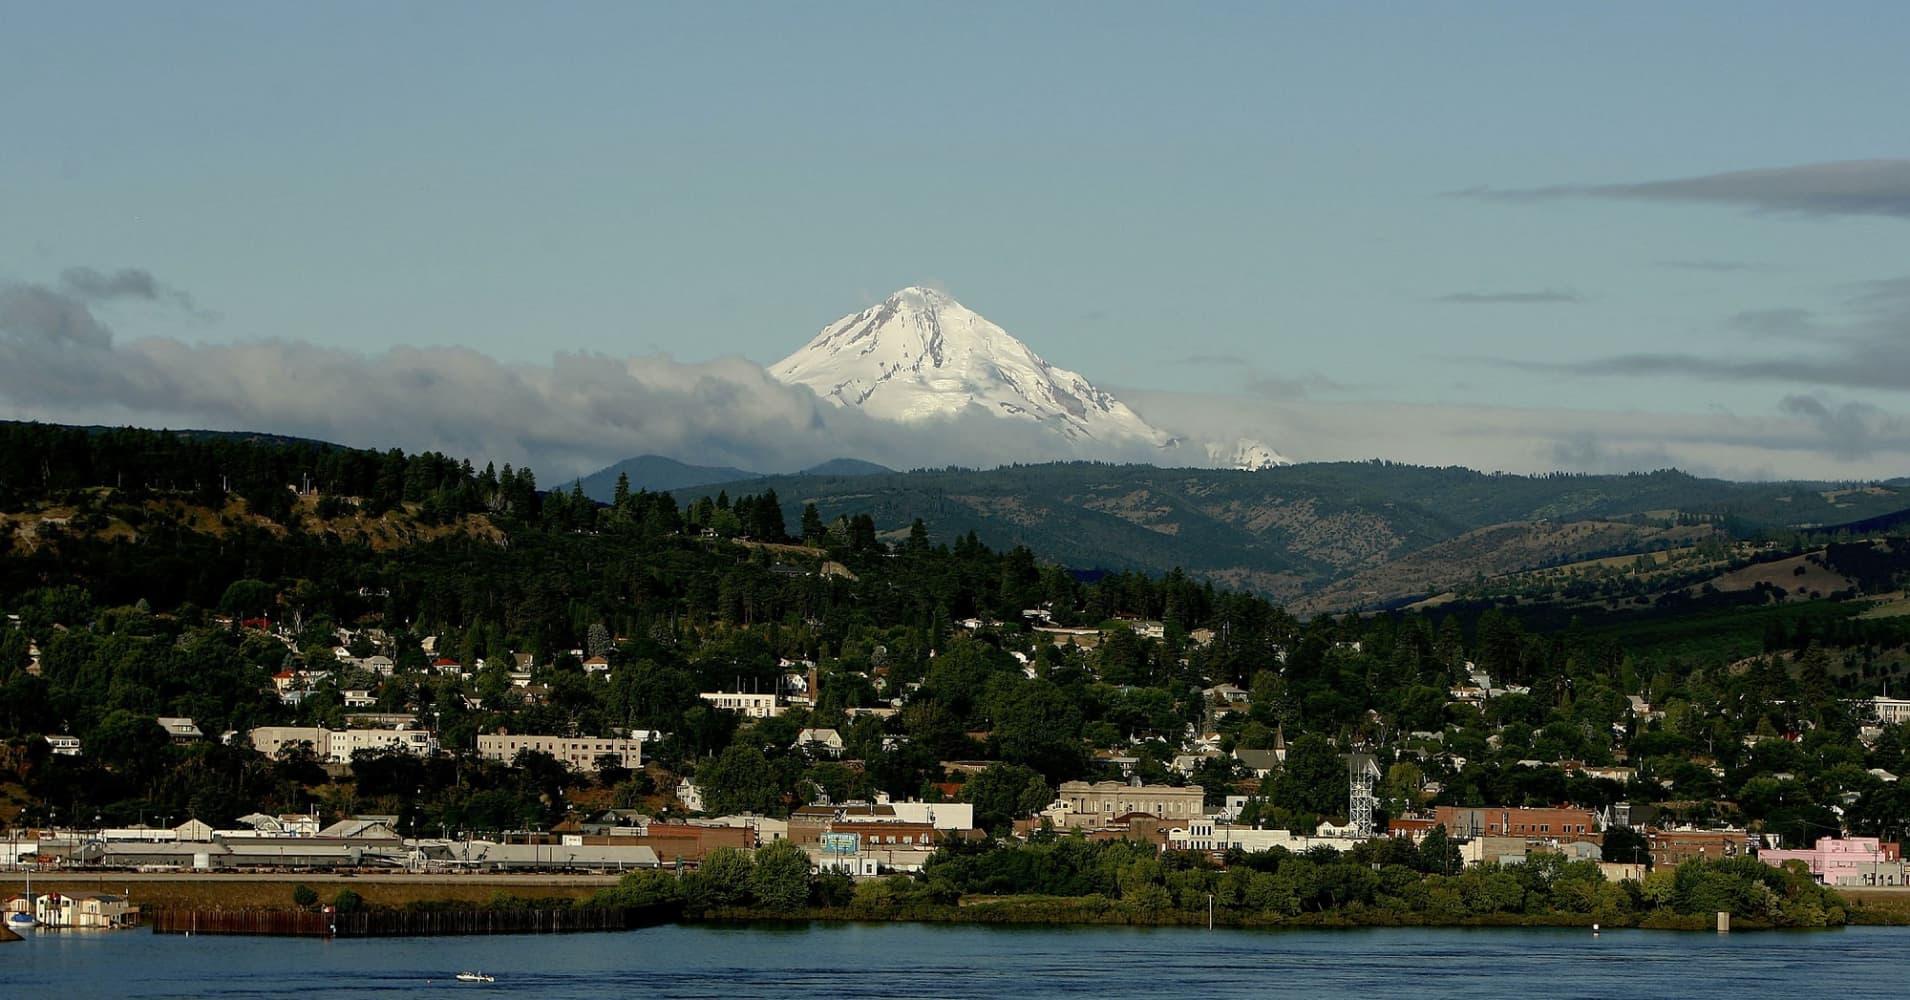 Mount Hood in Oregon